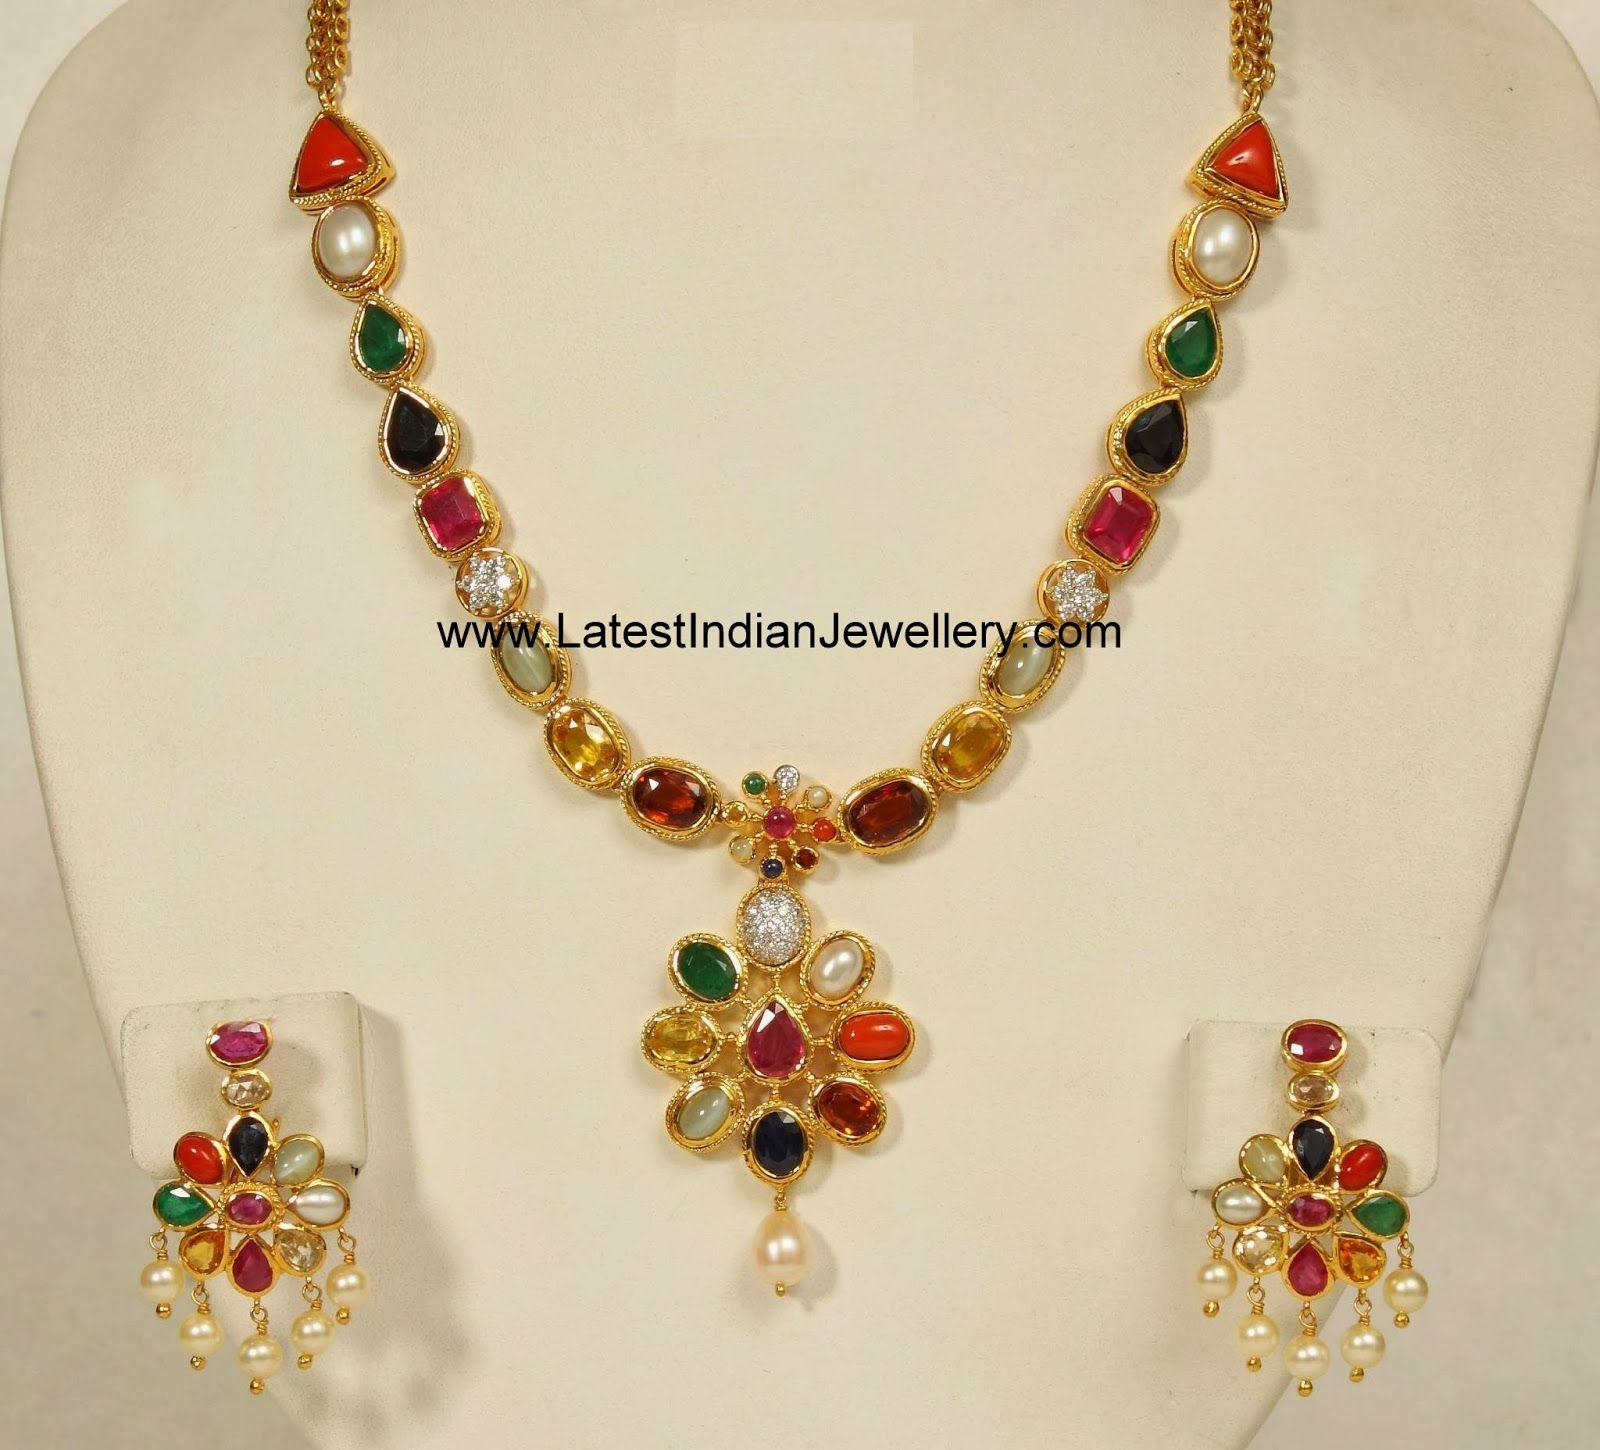 Designer Navartna Necklace Set | Designers, Indian gold jewelry ...